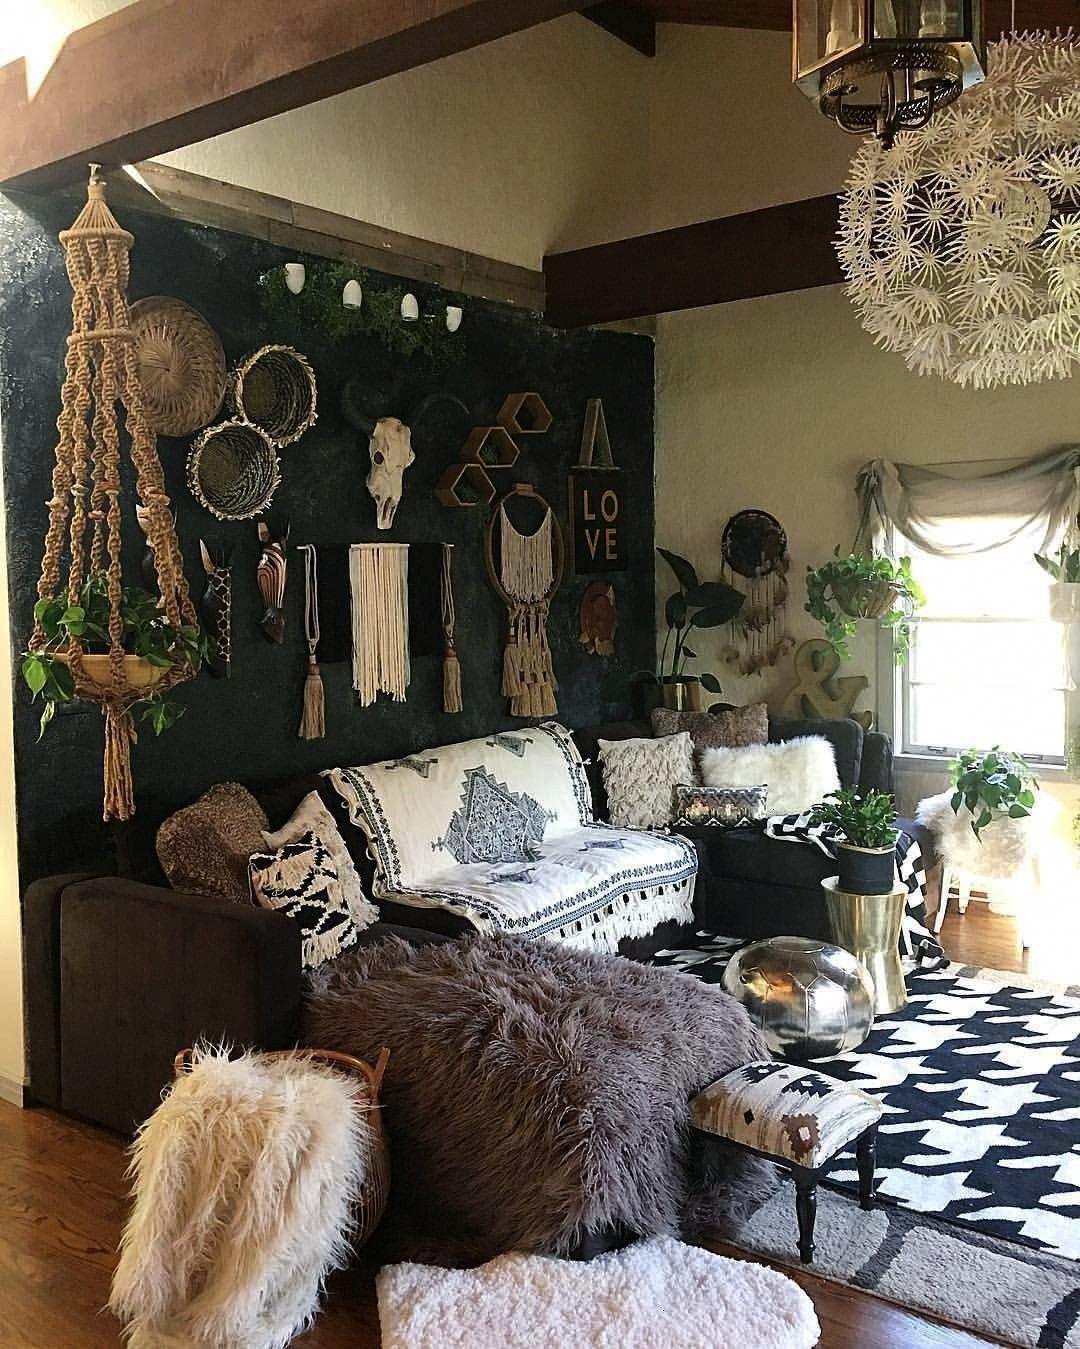 Eclecticdecor Livingroom Homedecor Eclectic Interior Design